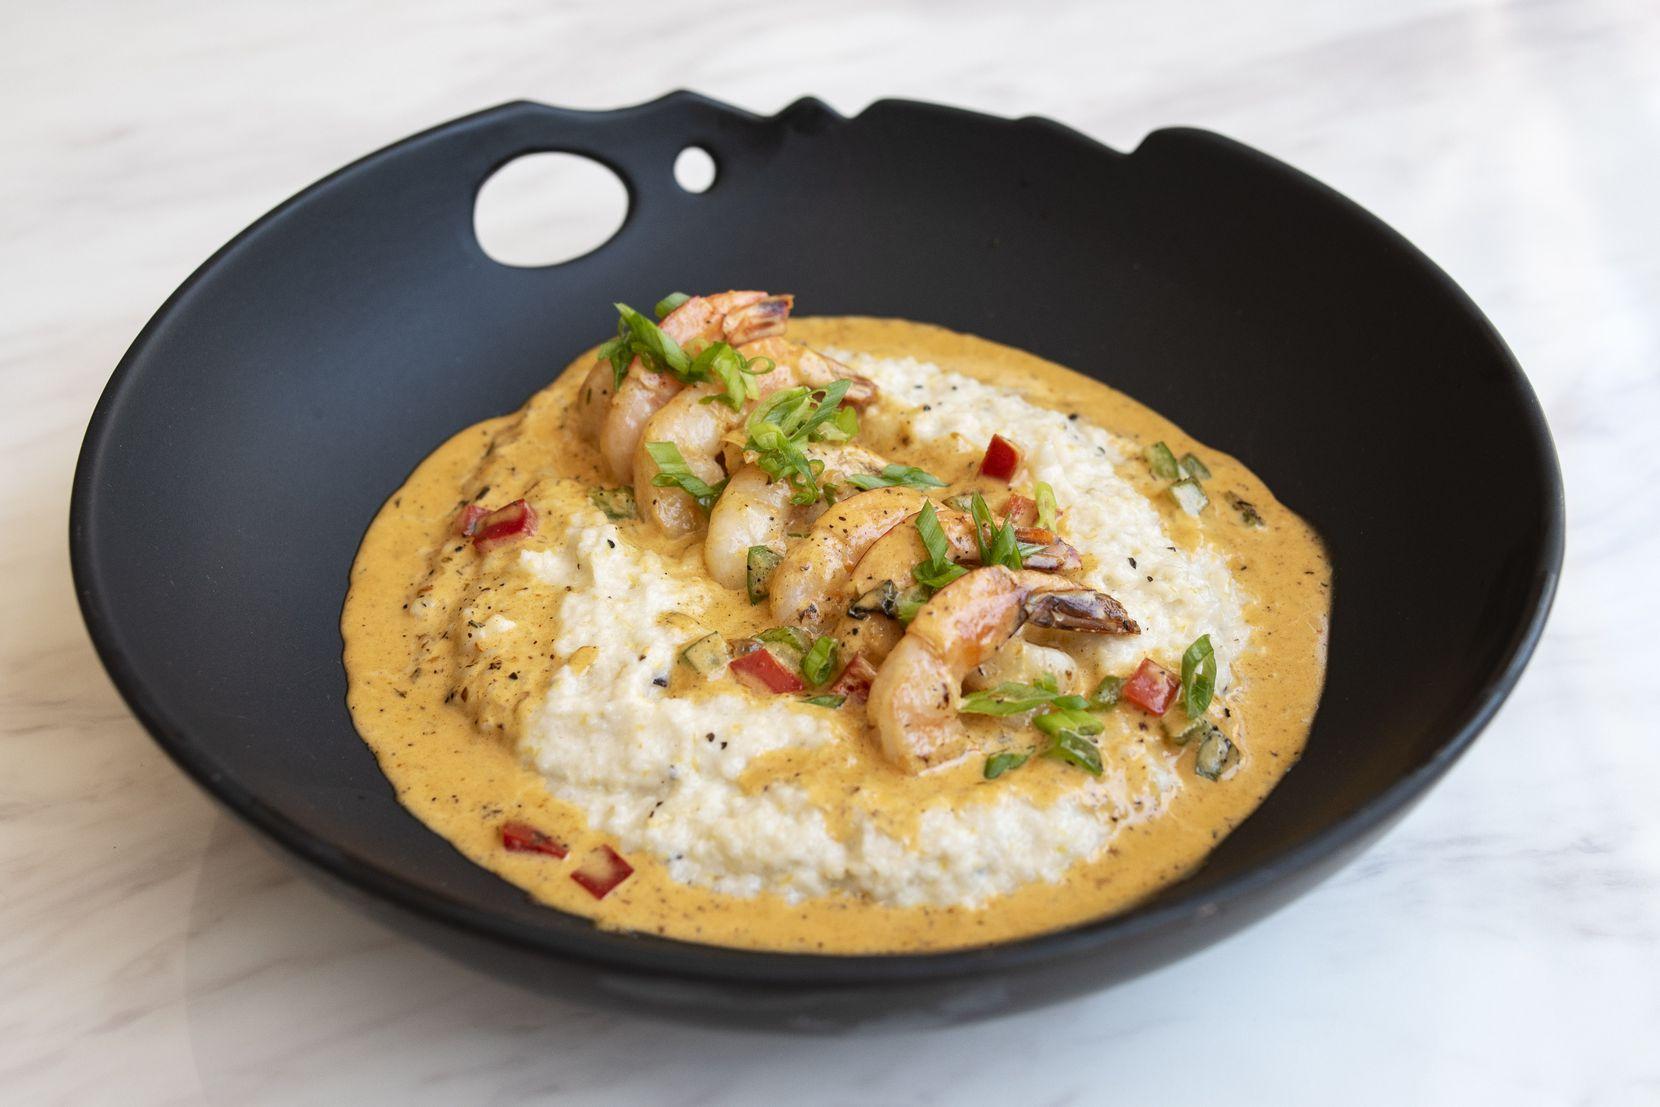 Shrimp and grits from True Kitchen + Kocktails